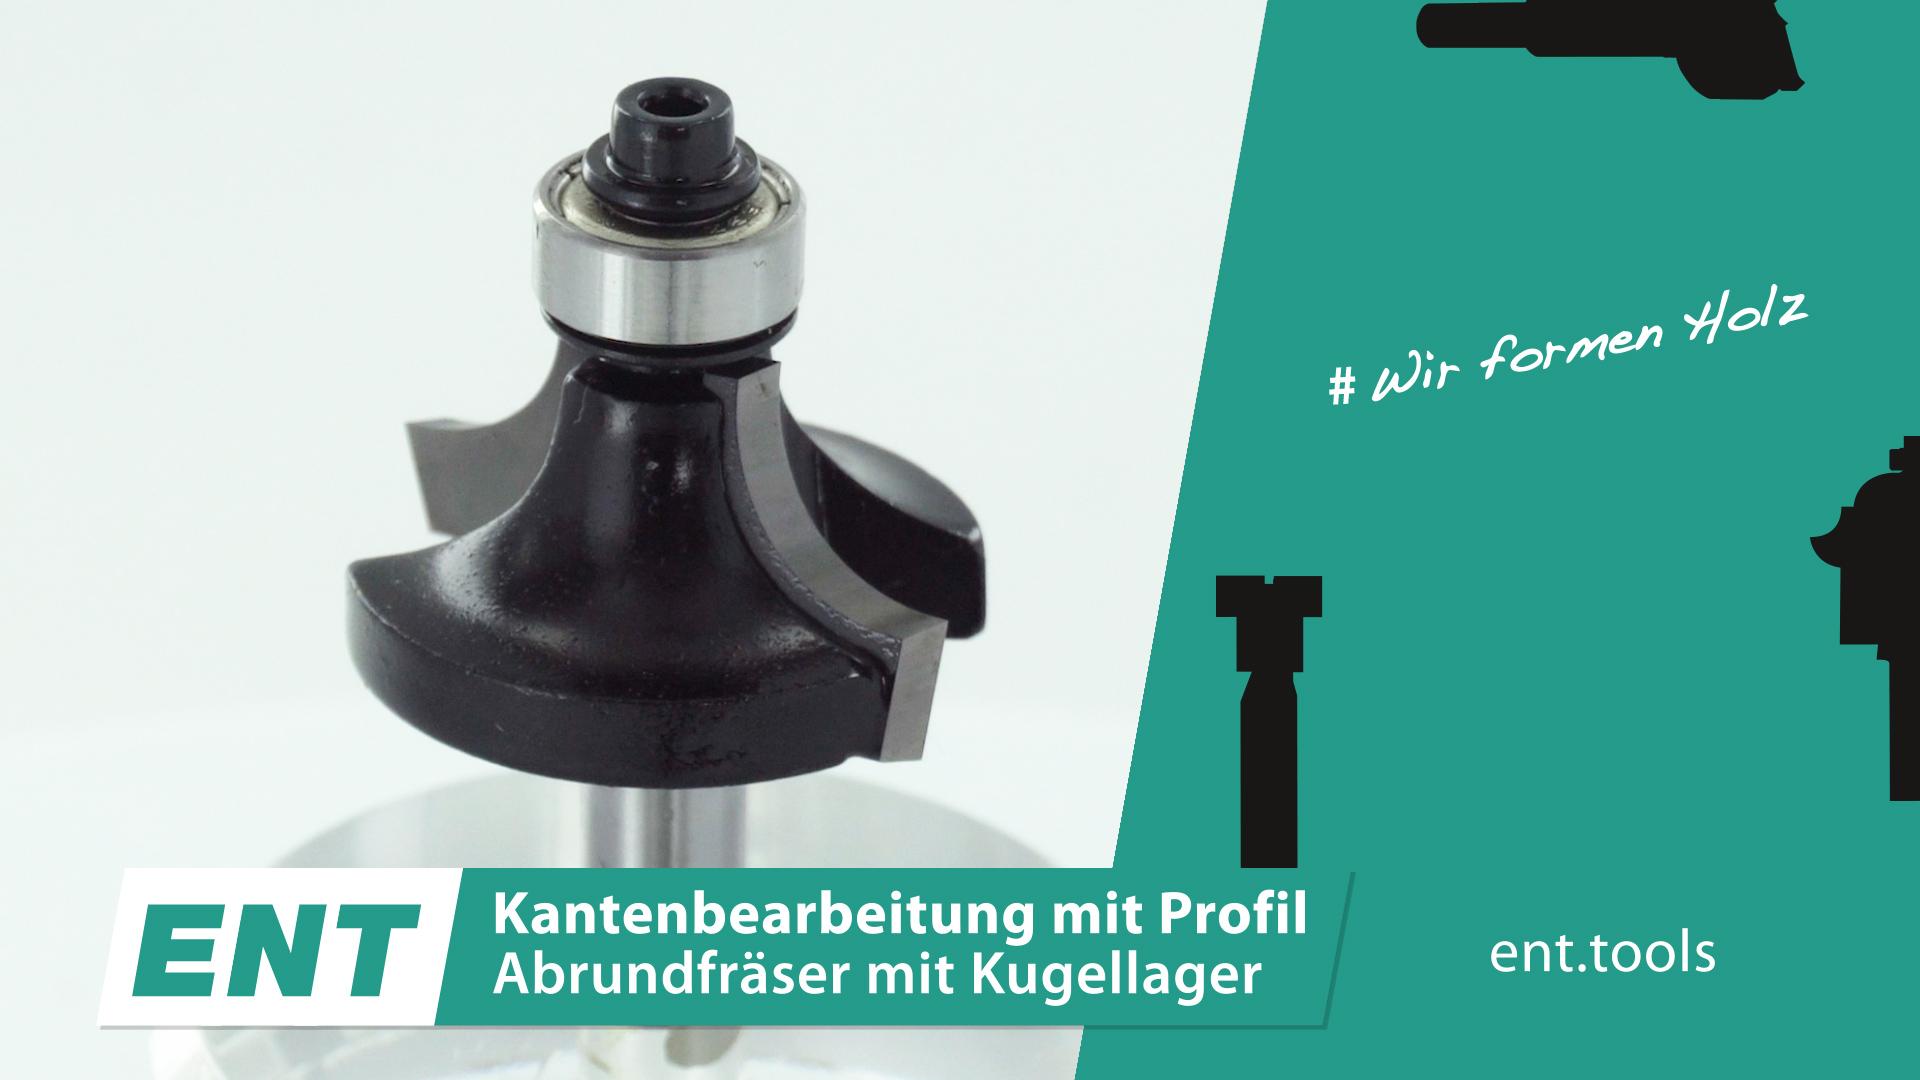 HW Abrundfräser Set mit Kugellager 4-6 R2-3 8-10 mm ENT 09001 6-tlg